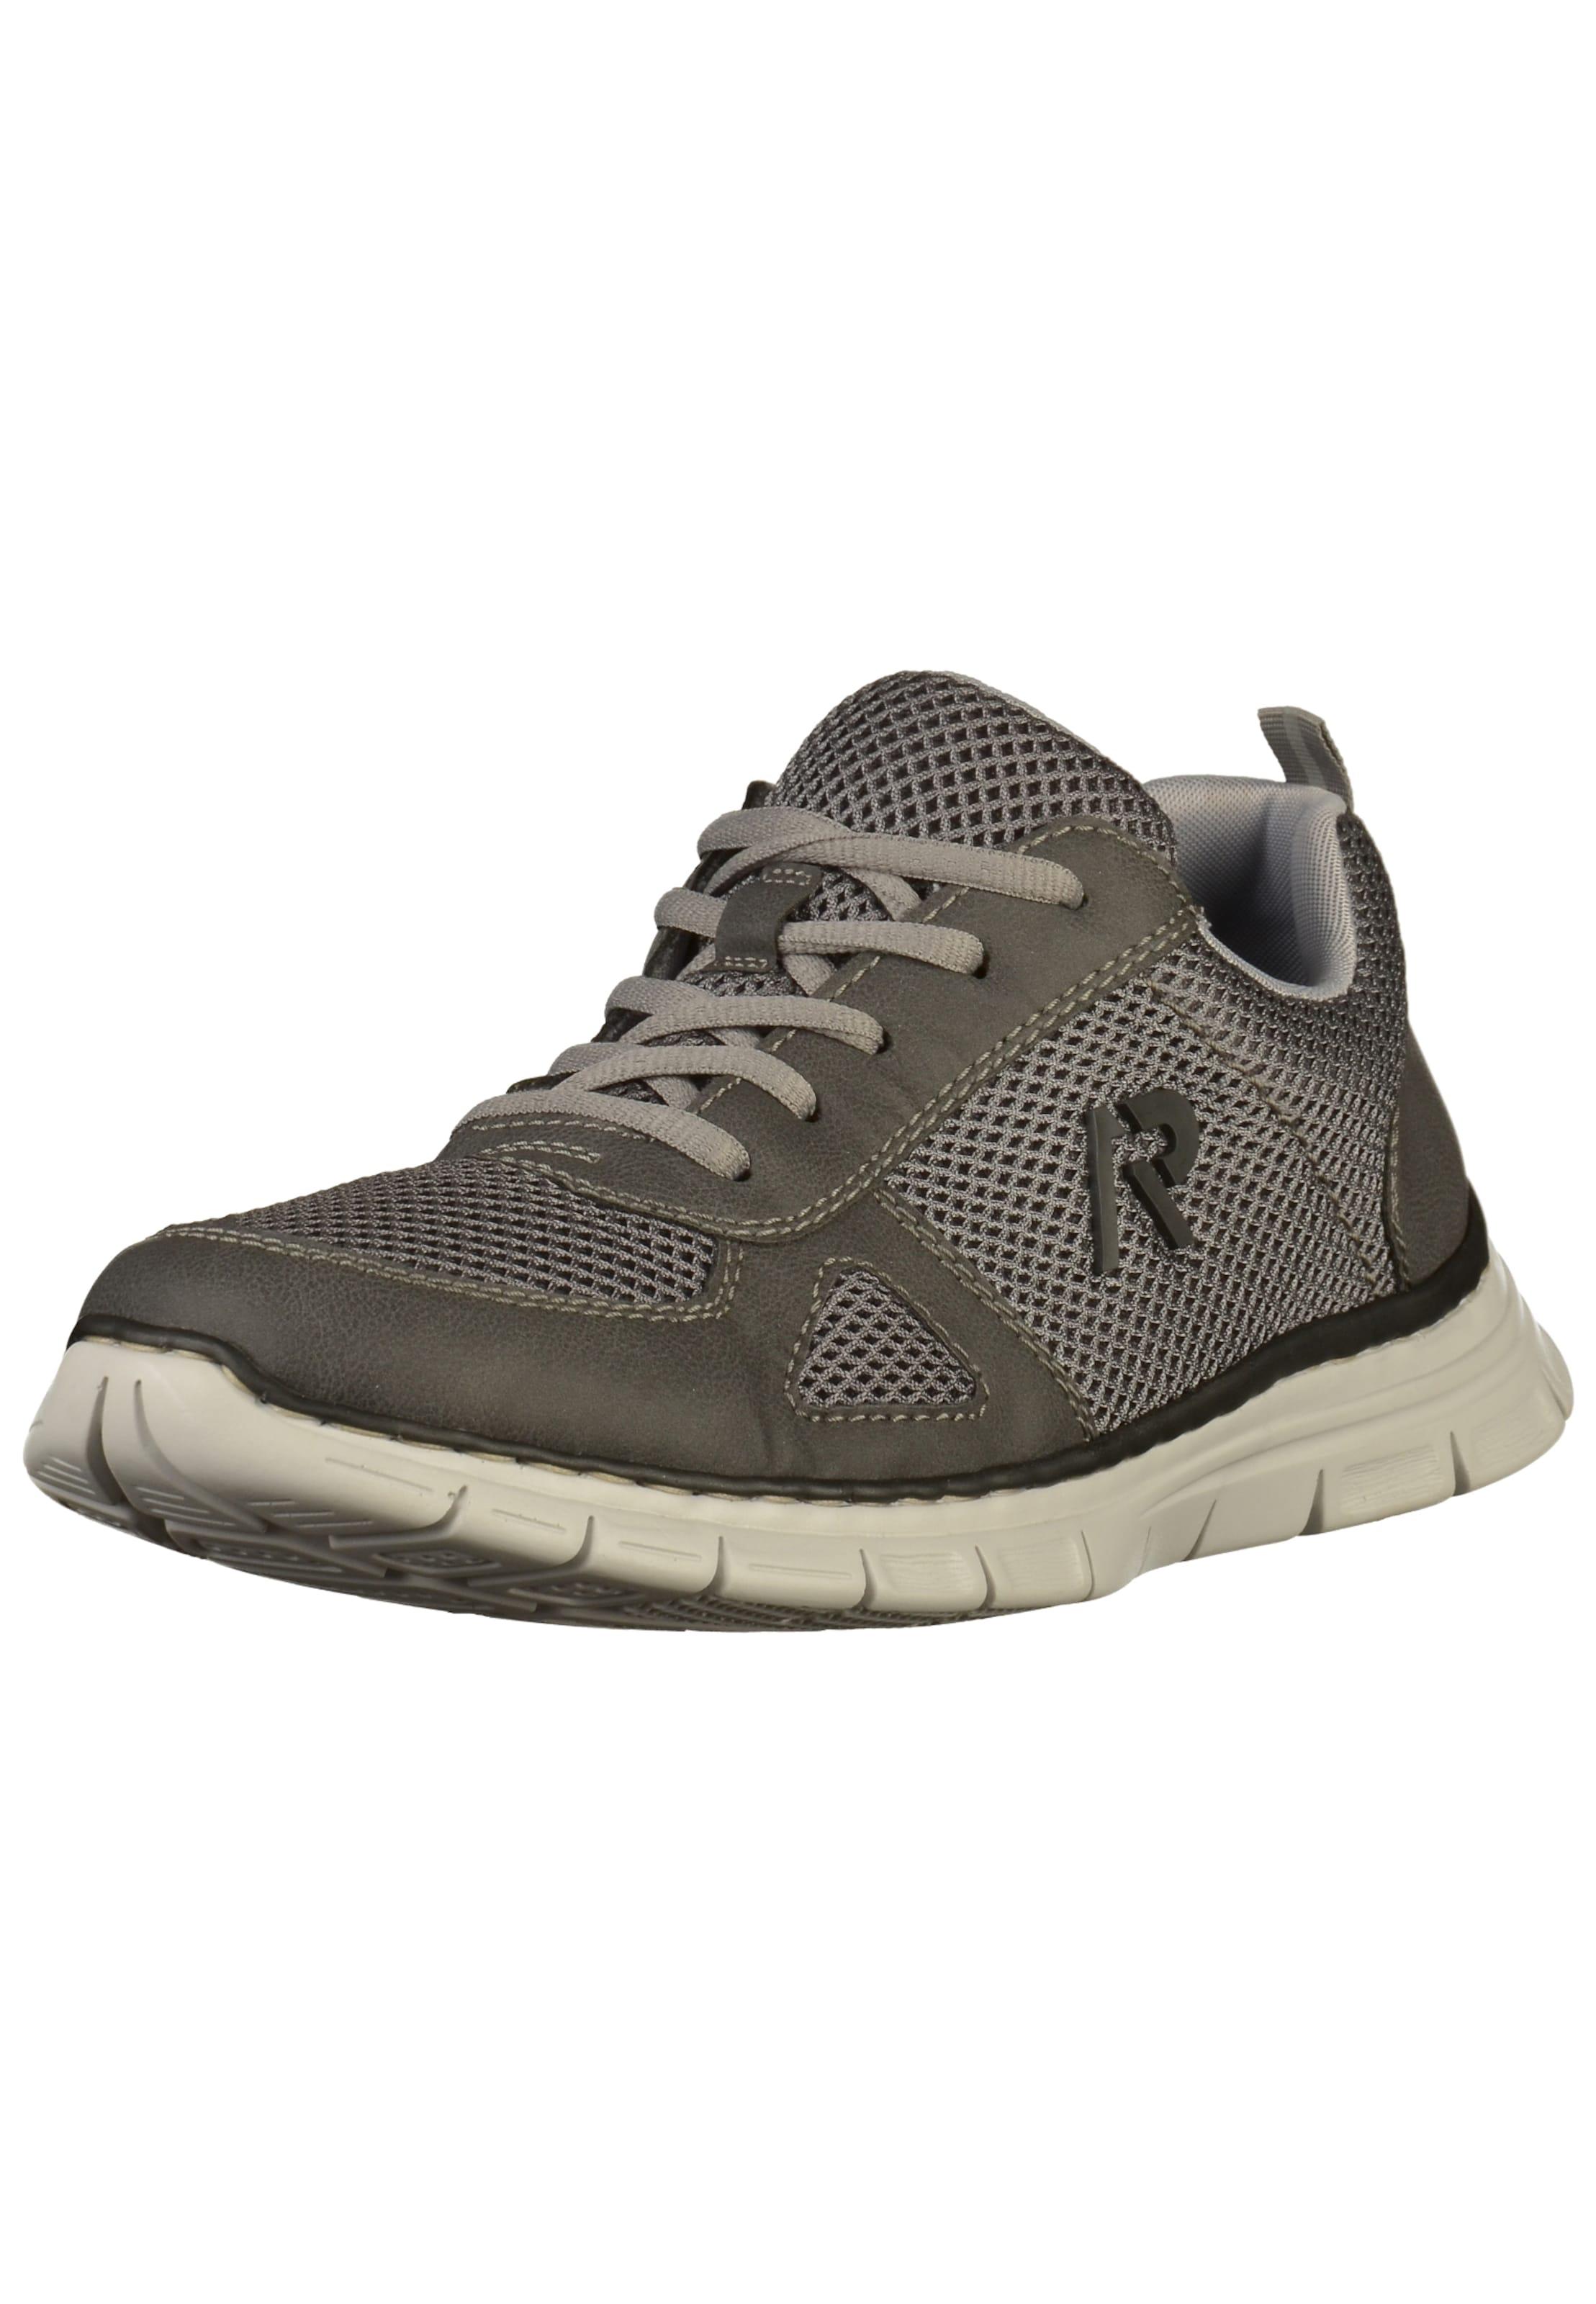 Haltbare Mode billige Gut Schuhe RIEKER | Sneaker Schuhe Gut billige getragene Schuhe 4d0556